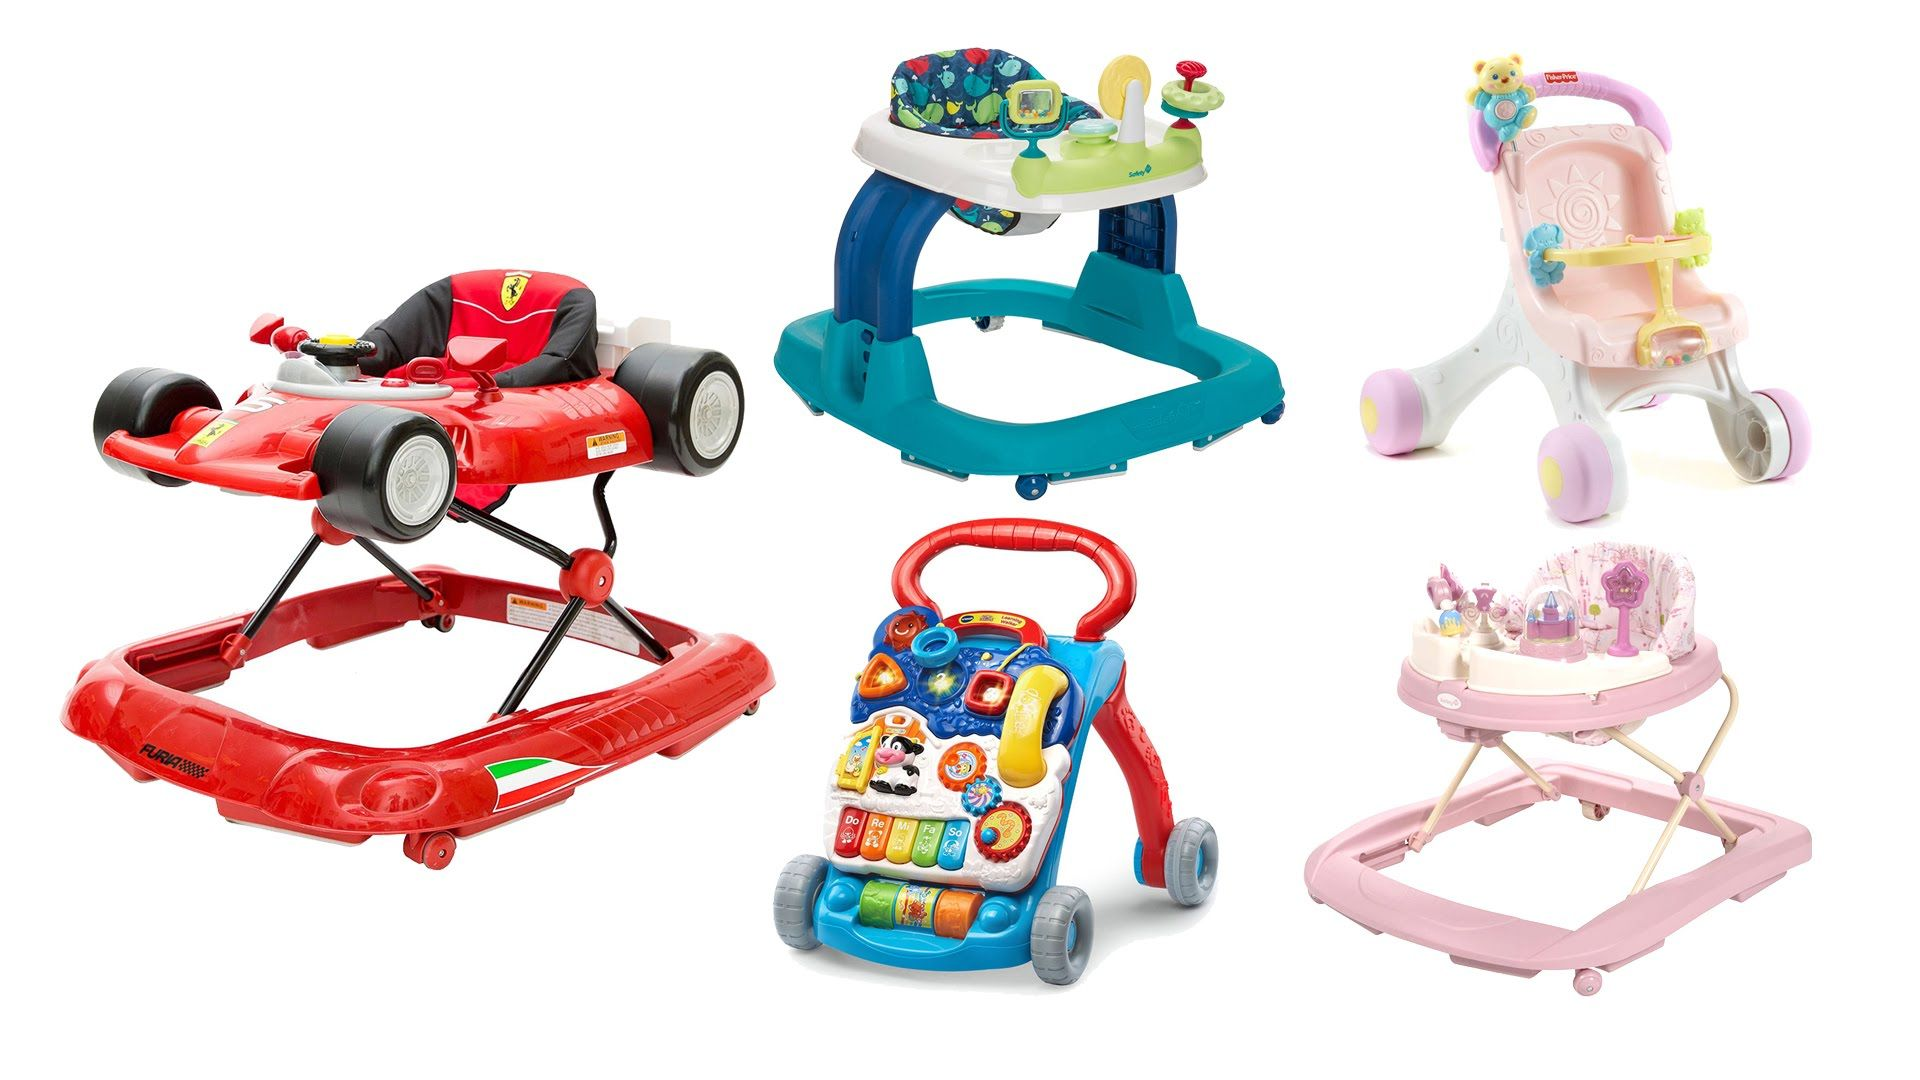 5 Best Baby Walker For Carpet Best Walker For Baby Learning To